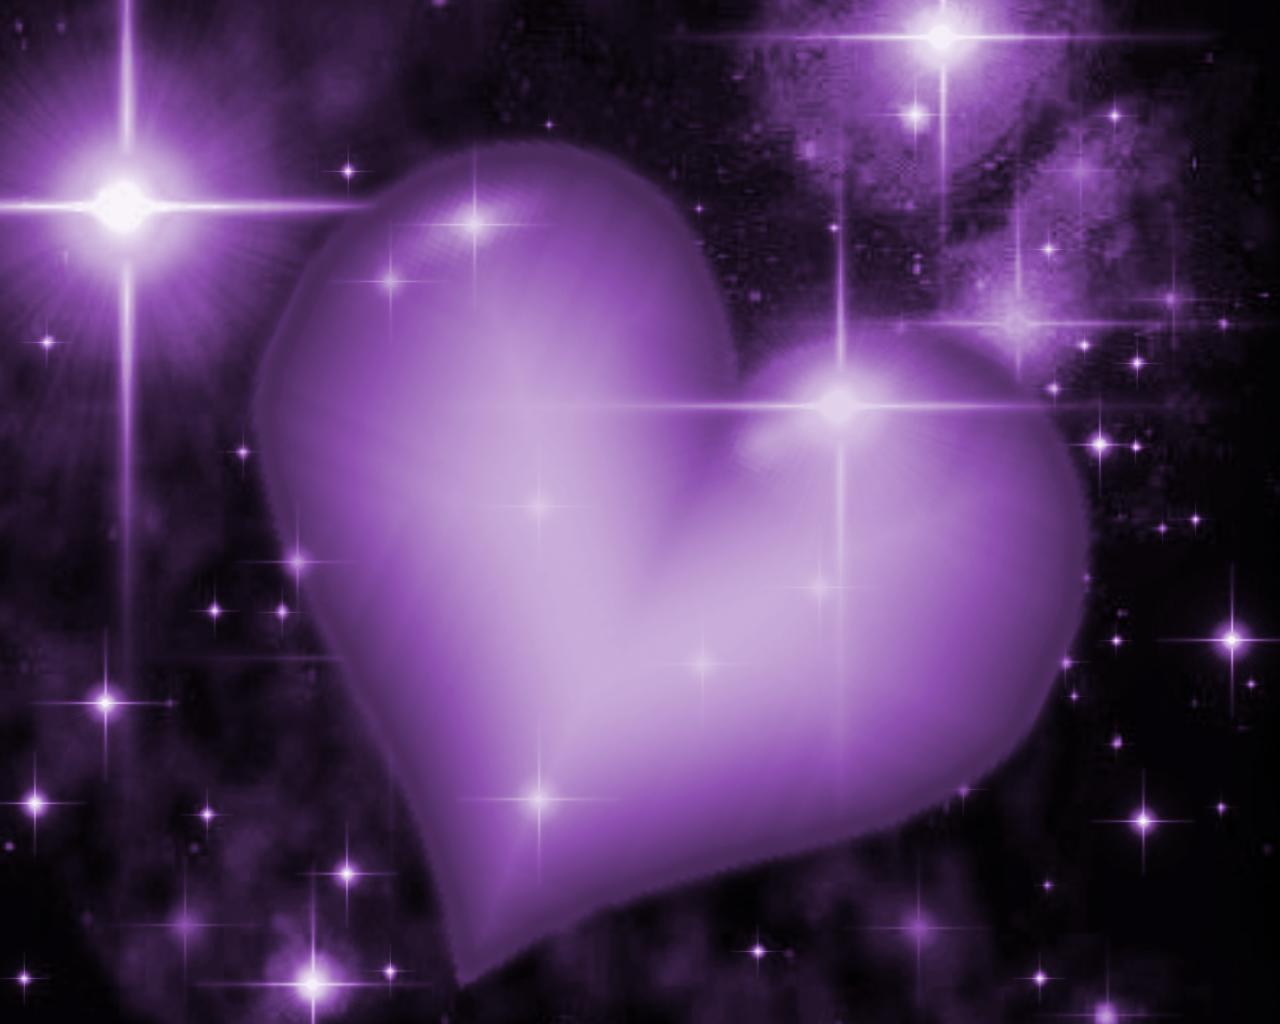 Banilung: purple wallpaper designs